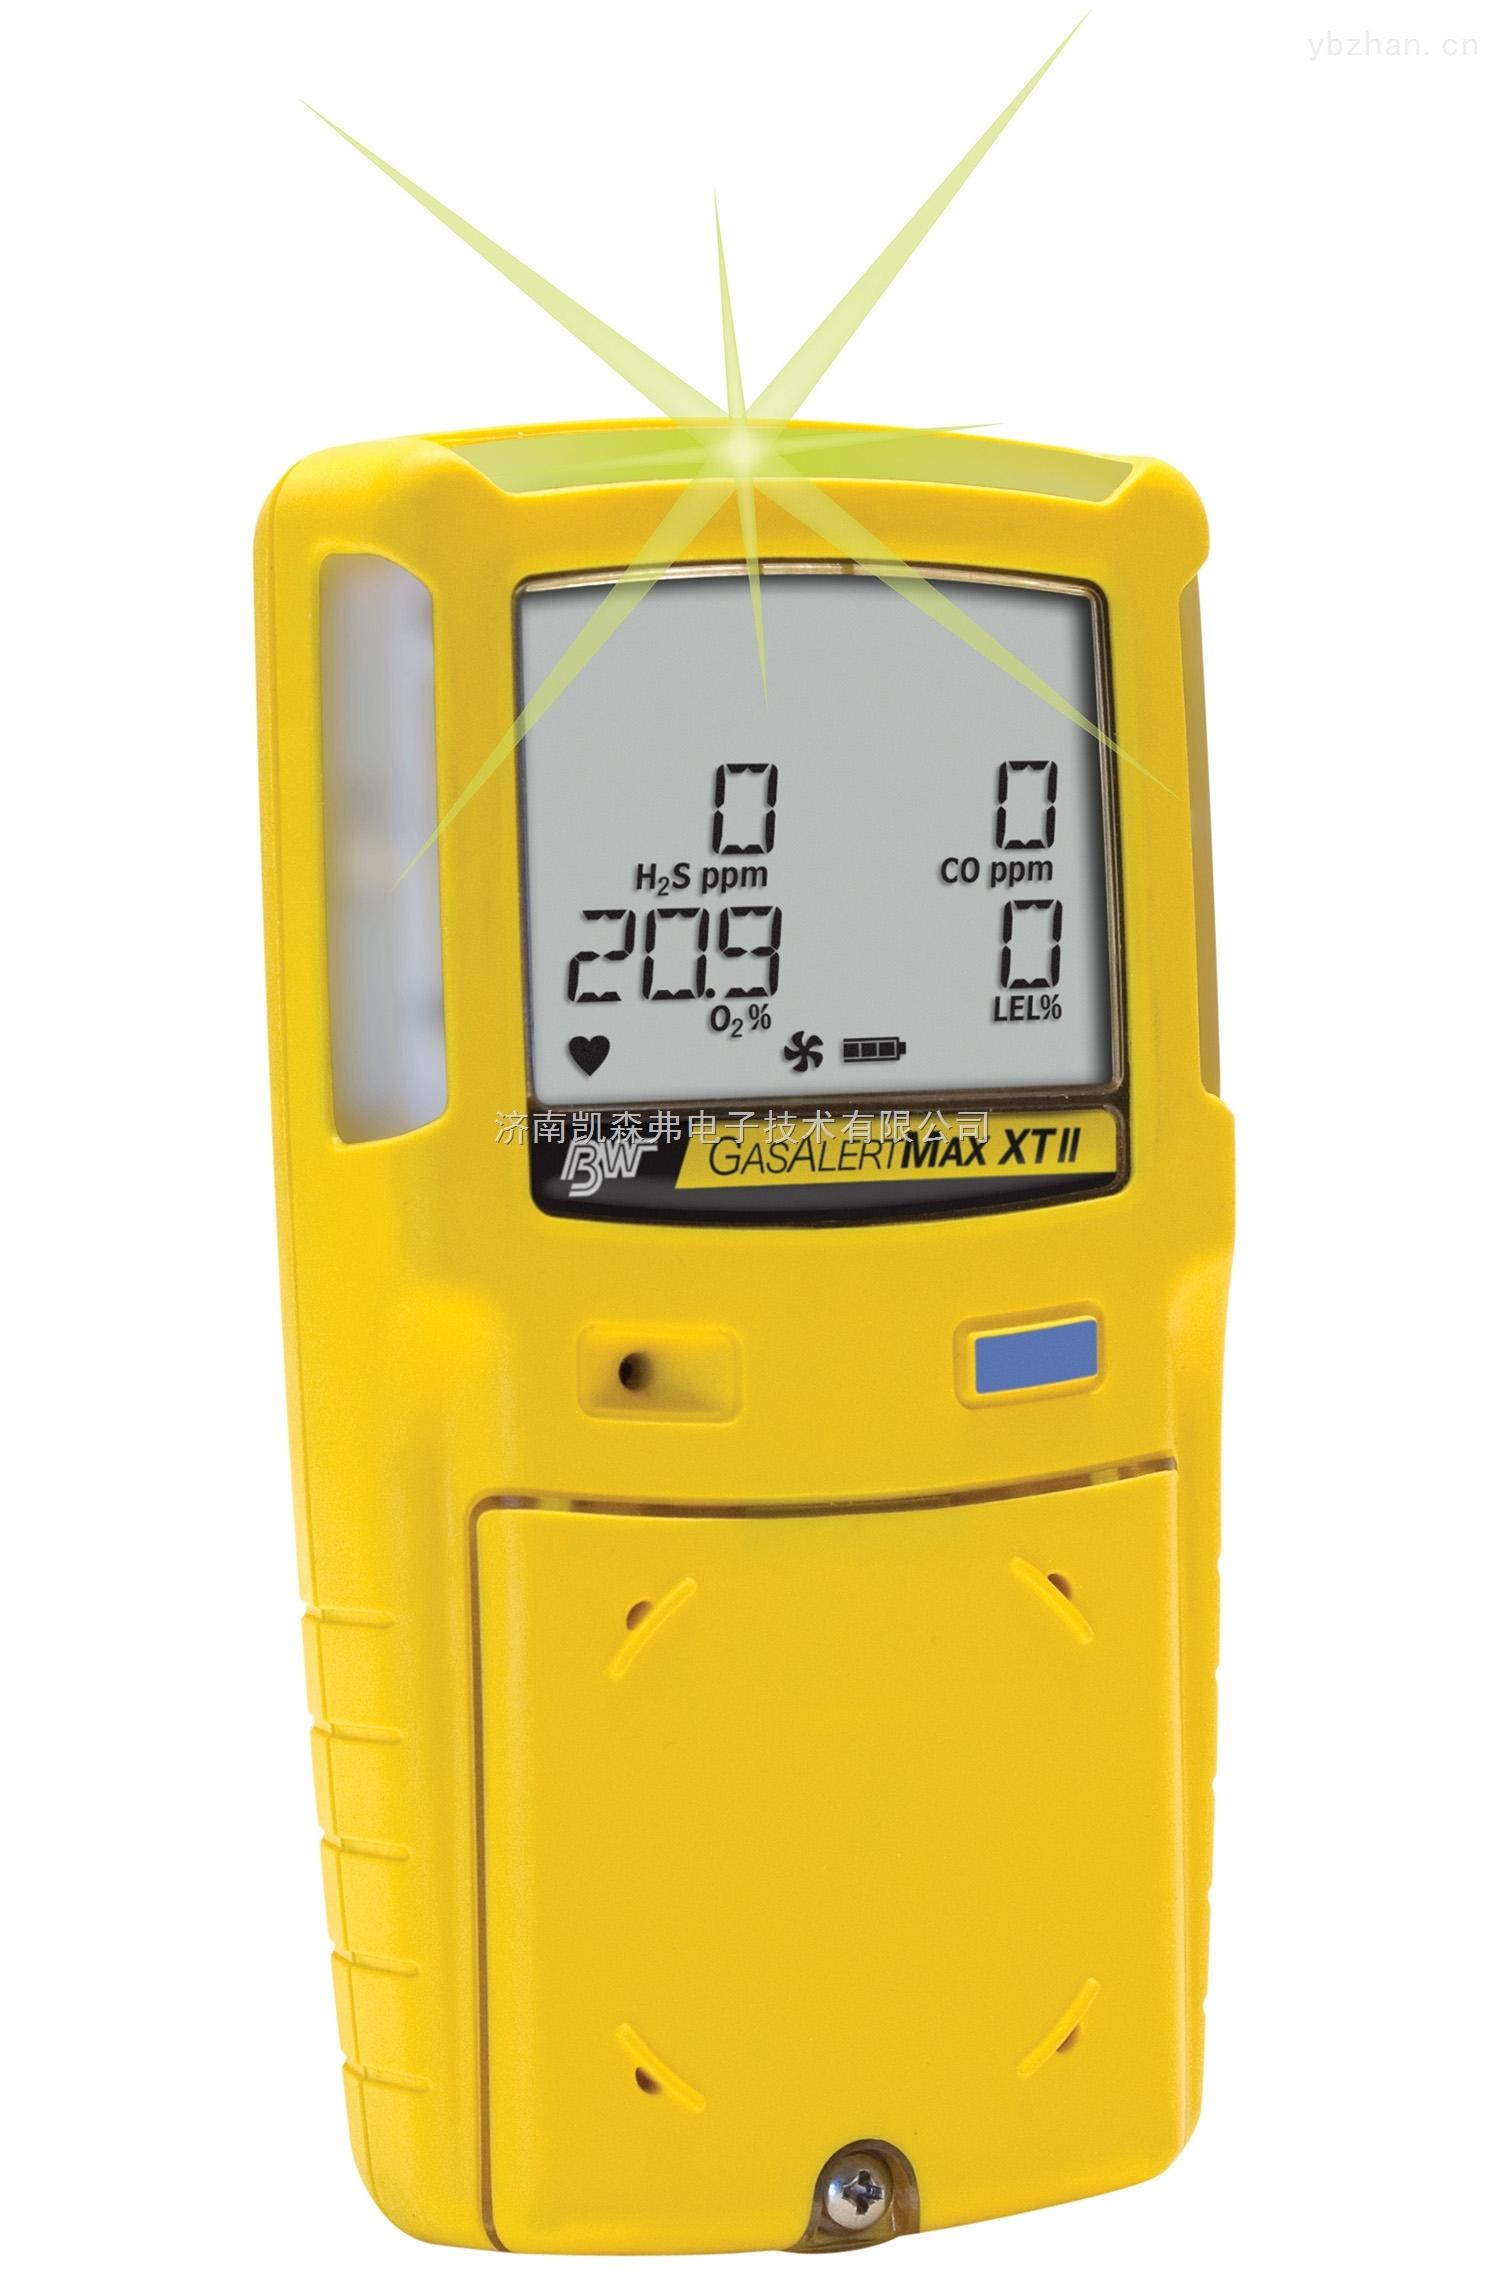 BW GasAlertMax XT 一体化泵吸式复合气体检测仪